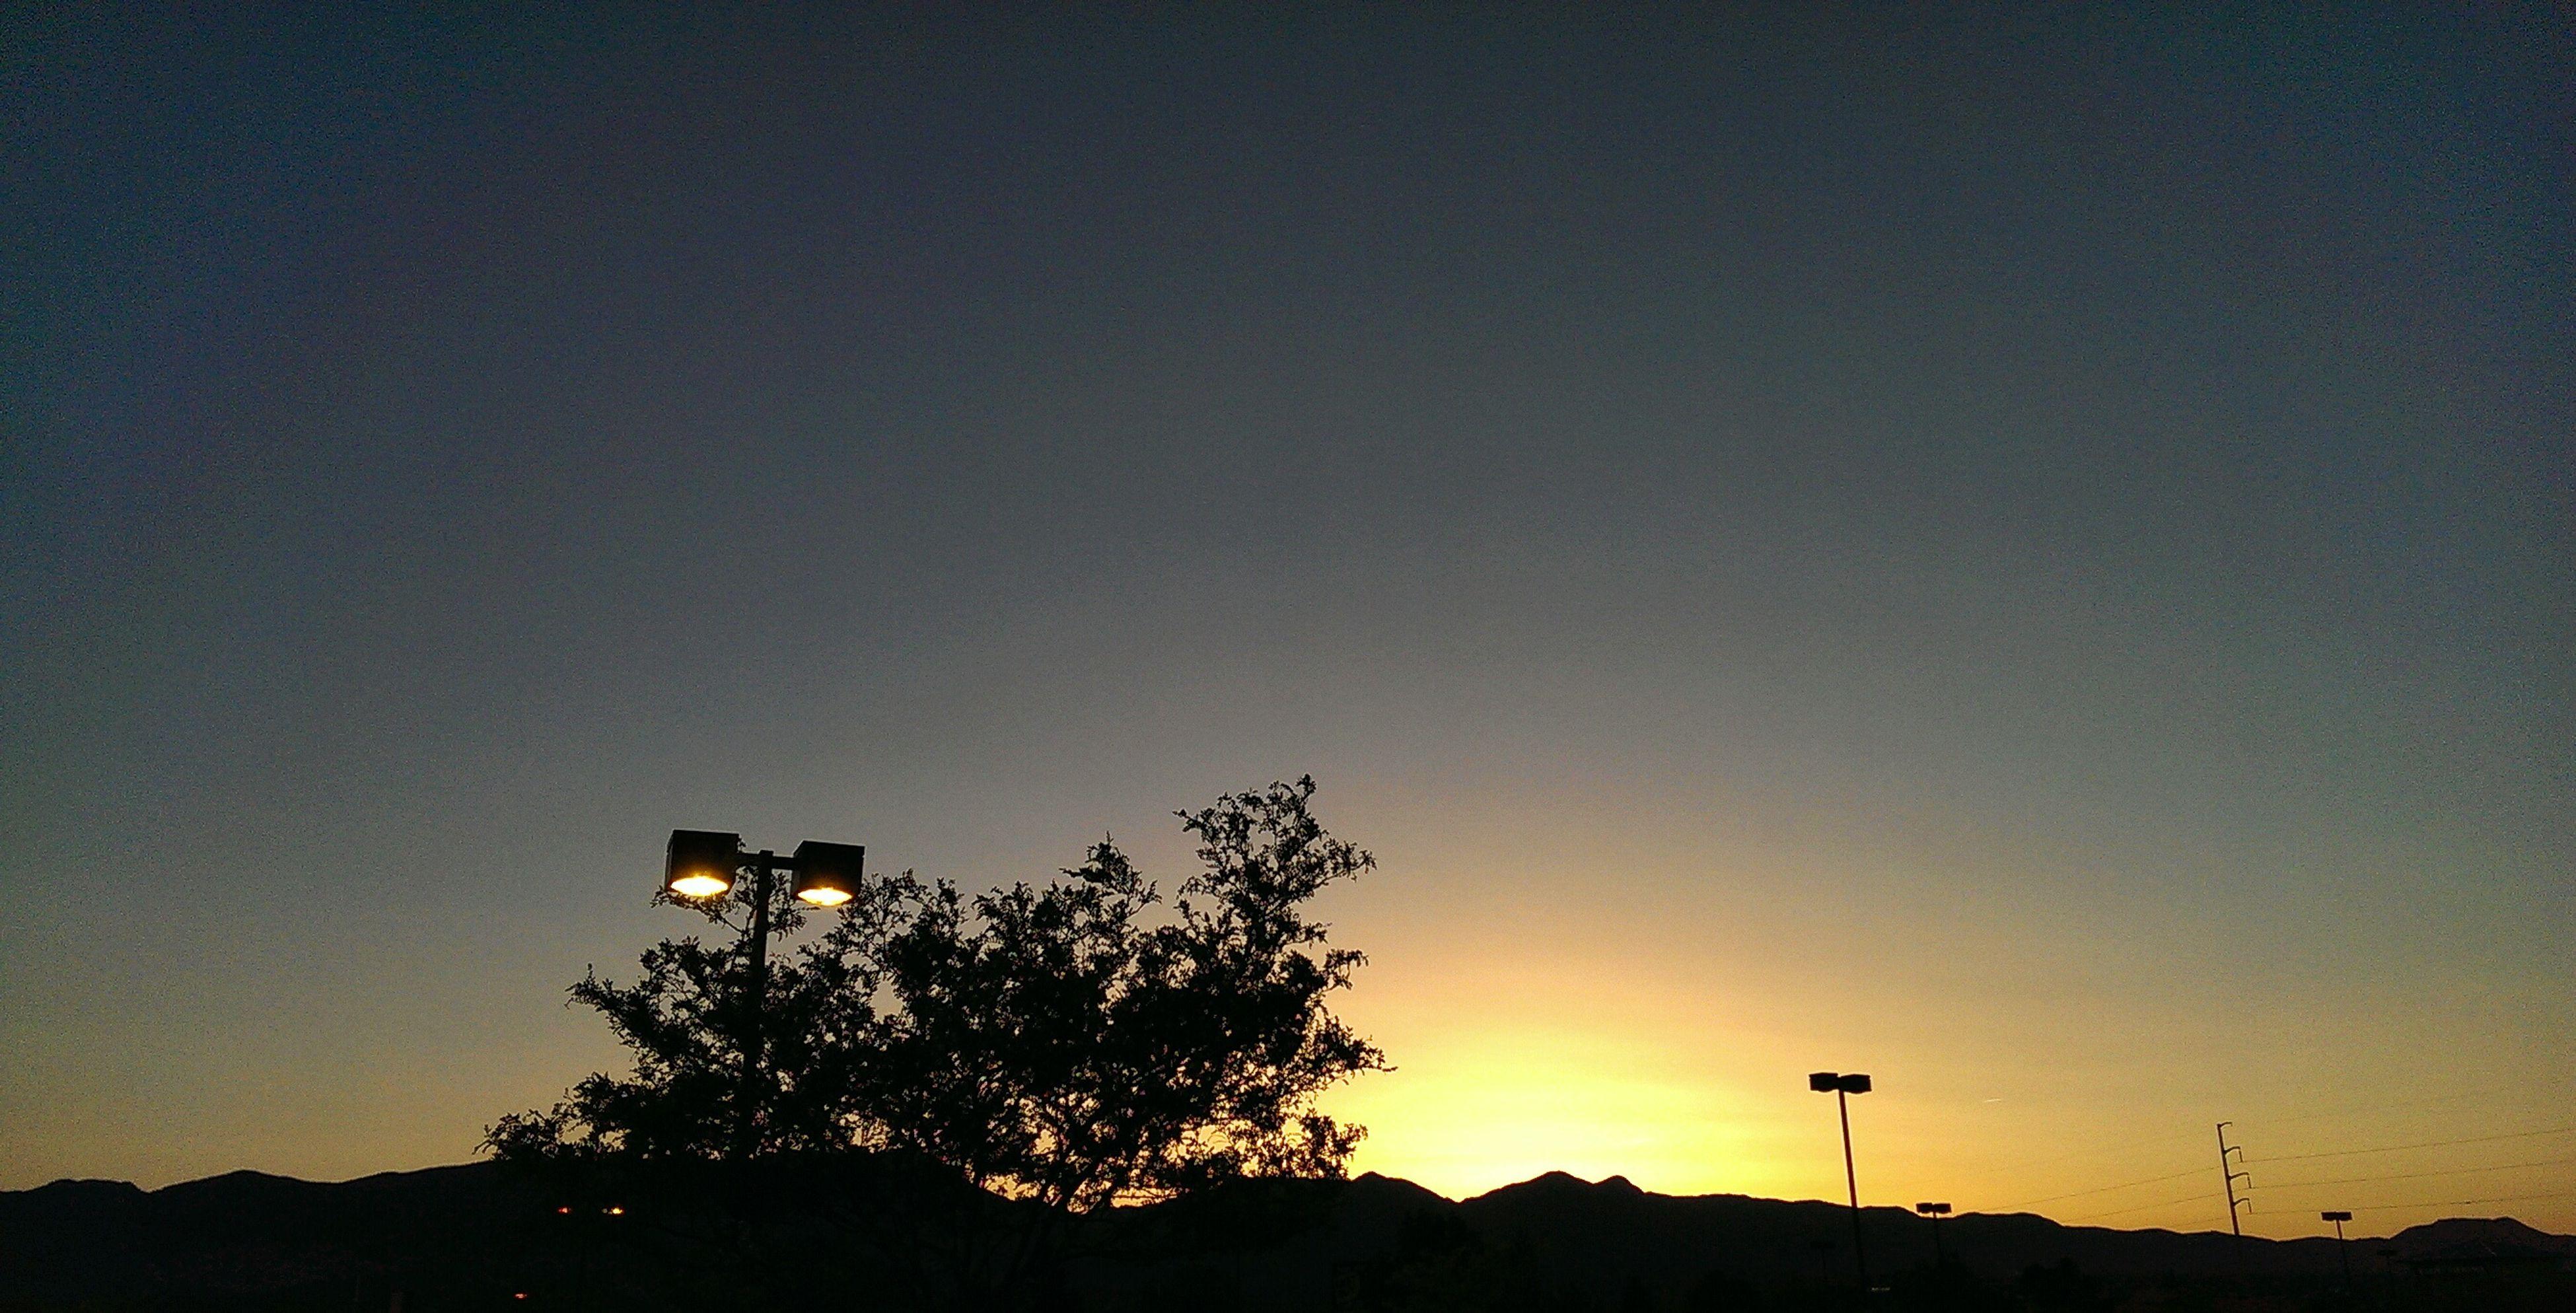 Sunset Silhouette Sunset Silhouettes Landscape